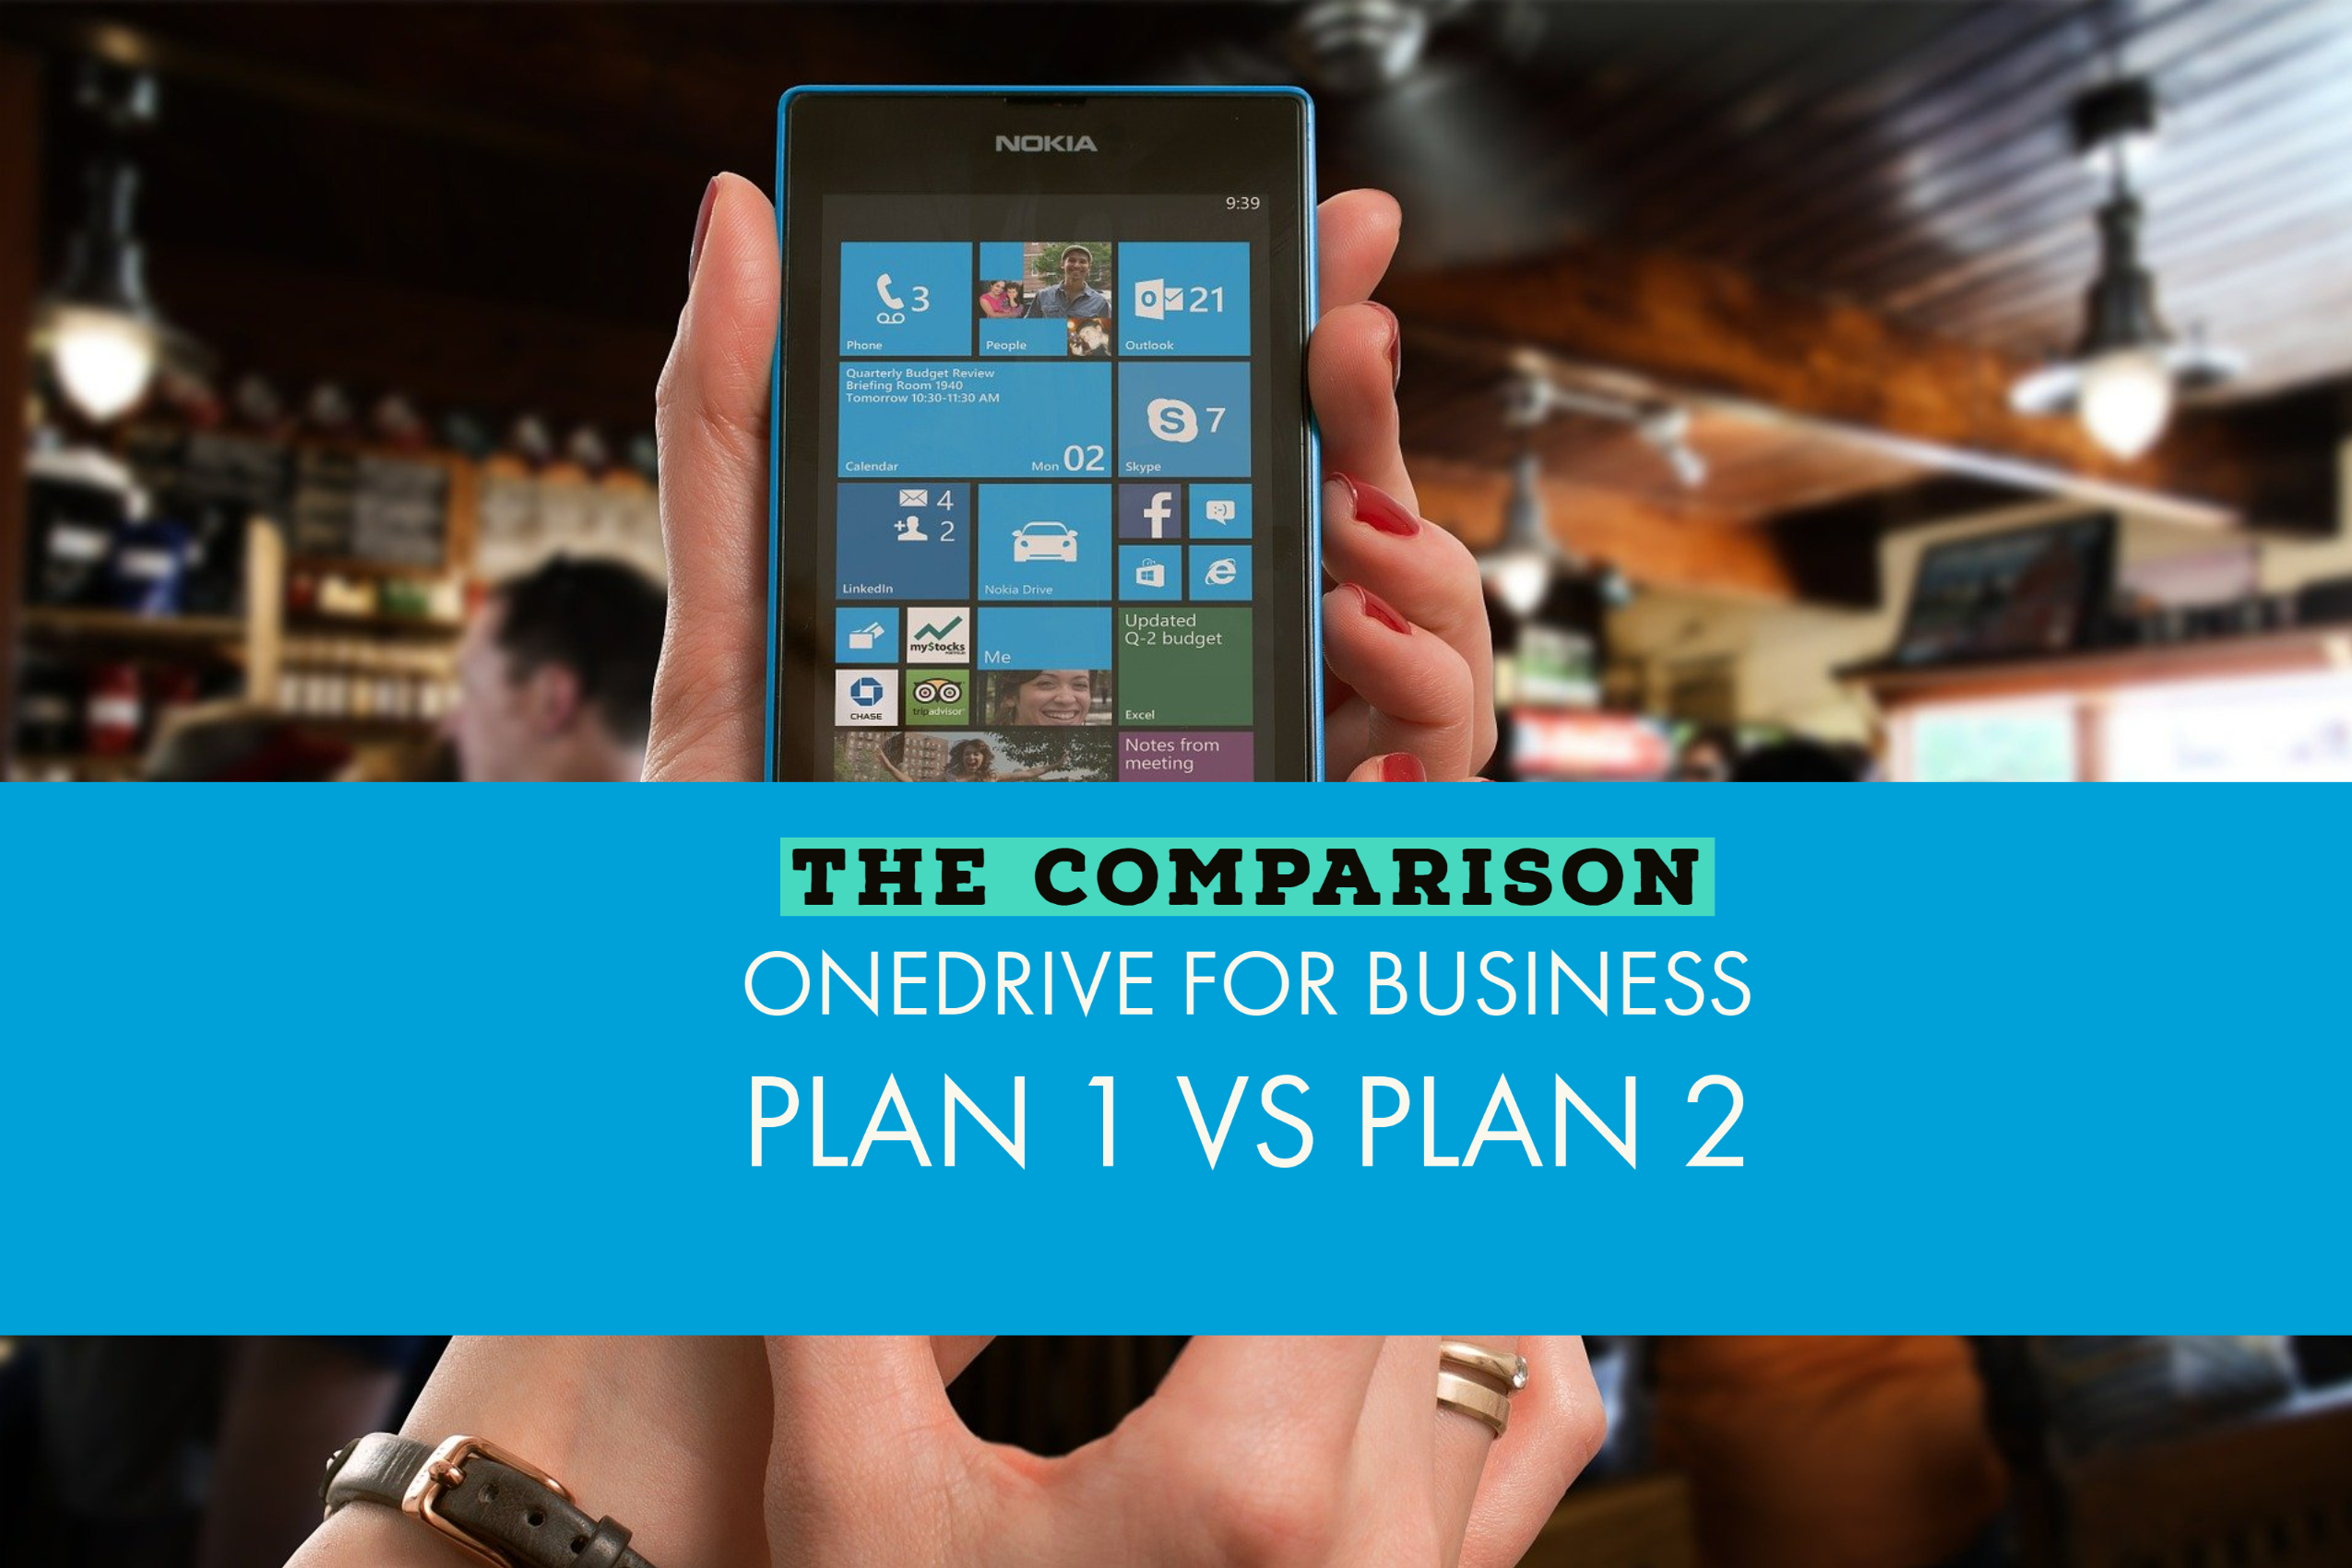 OneDrive for Business Plan 1 vs Plan 2